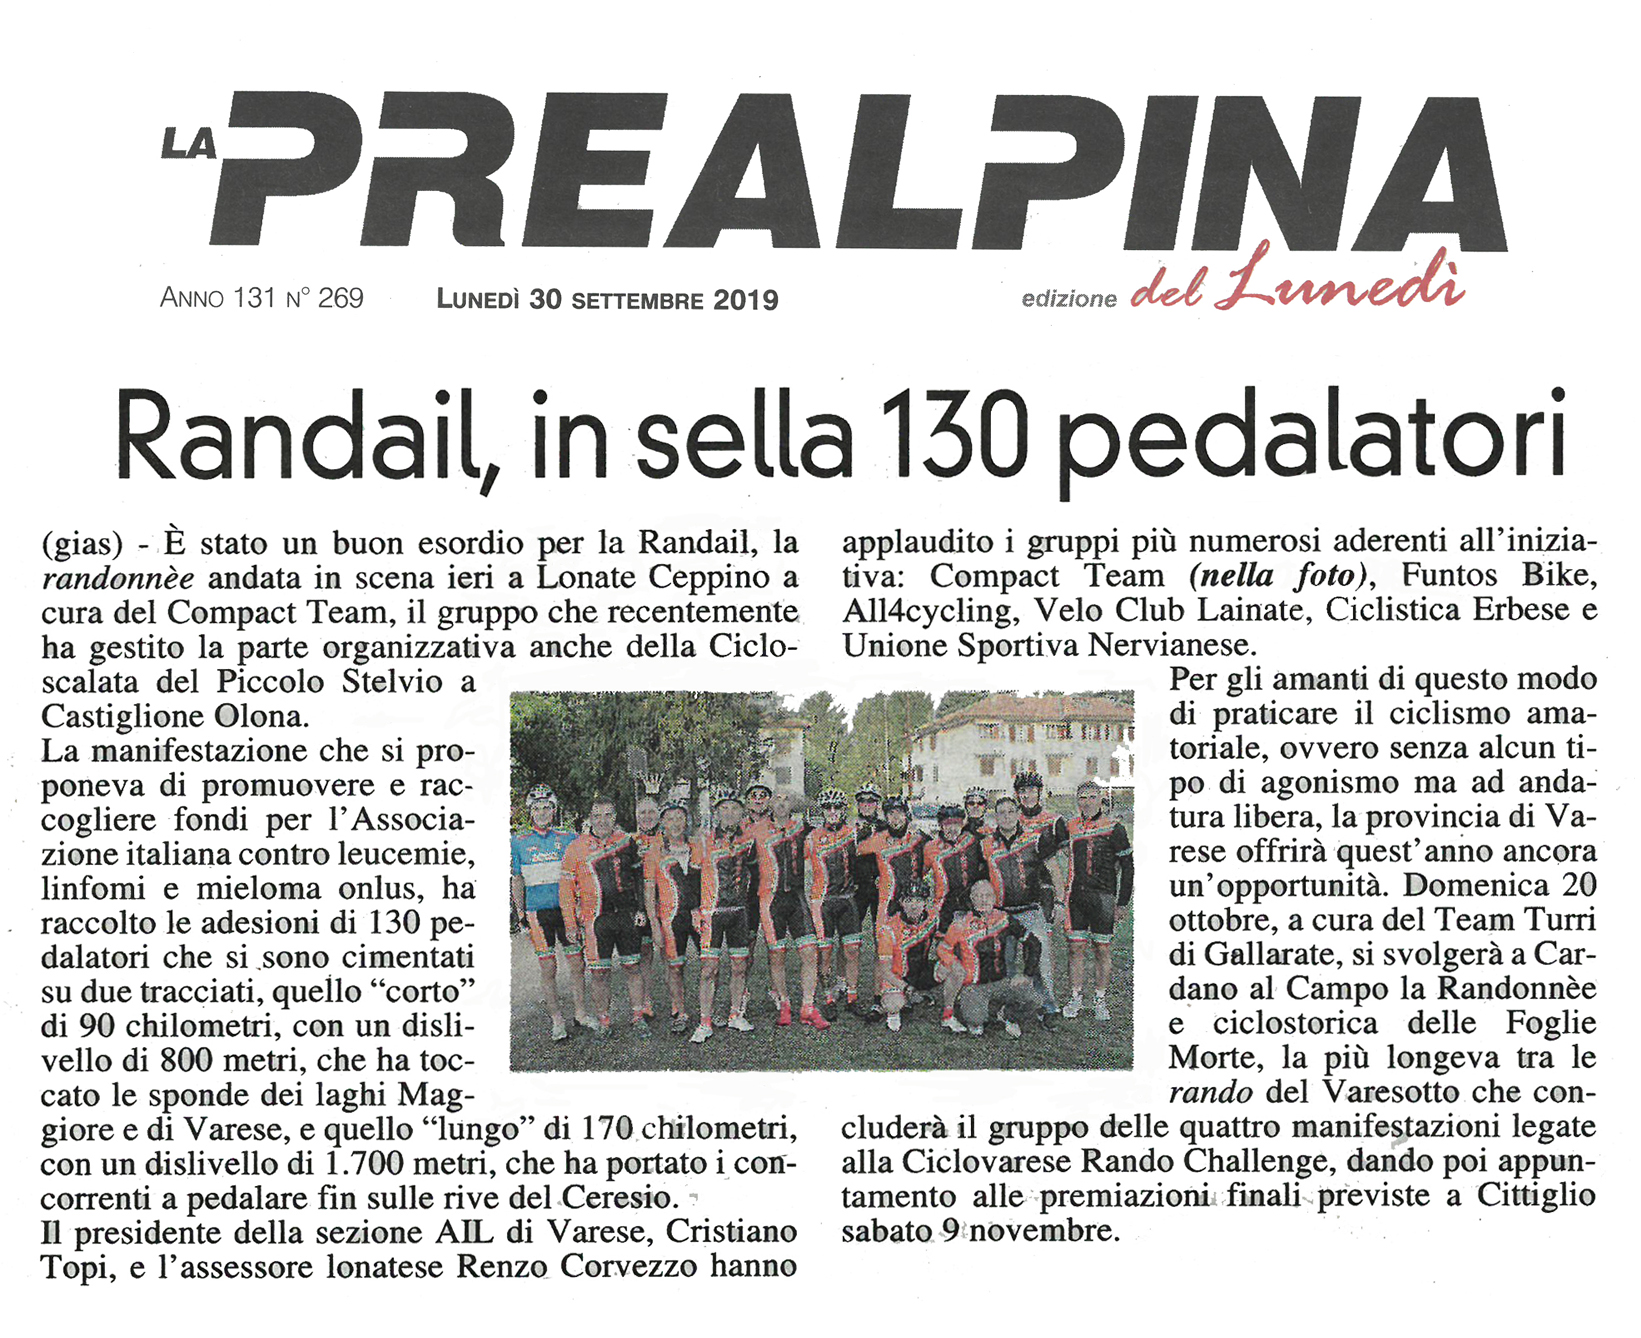 Prealpina - Randoail